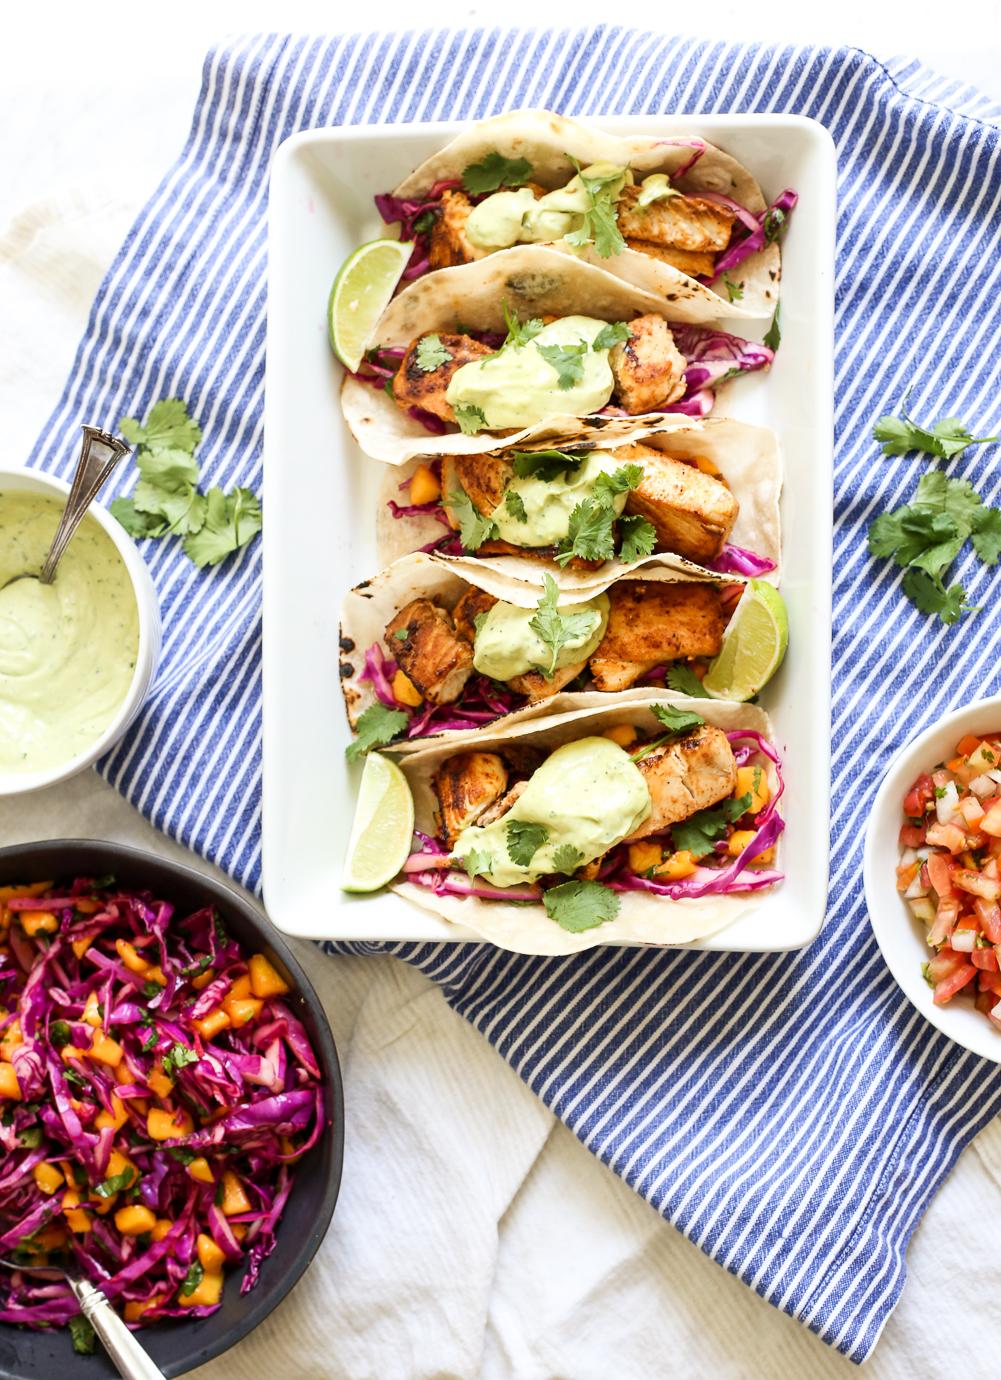 Baja Fish Tacos with Mango Coleslaw and Avocado Crema